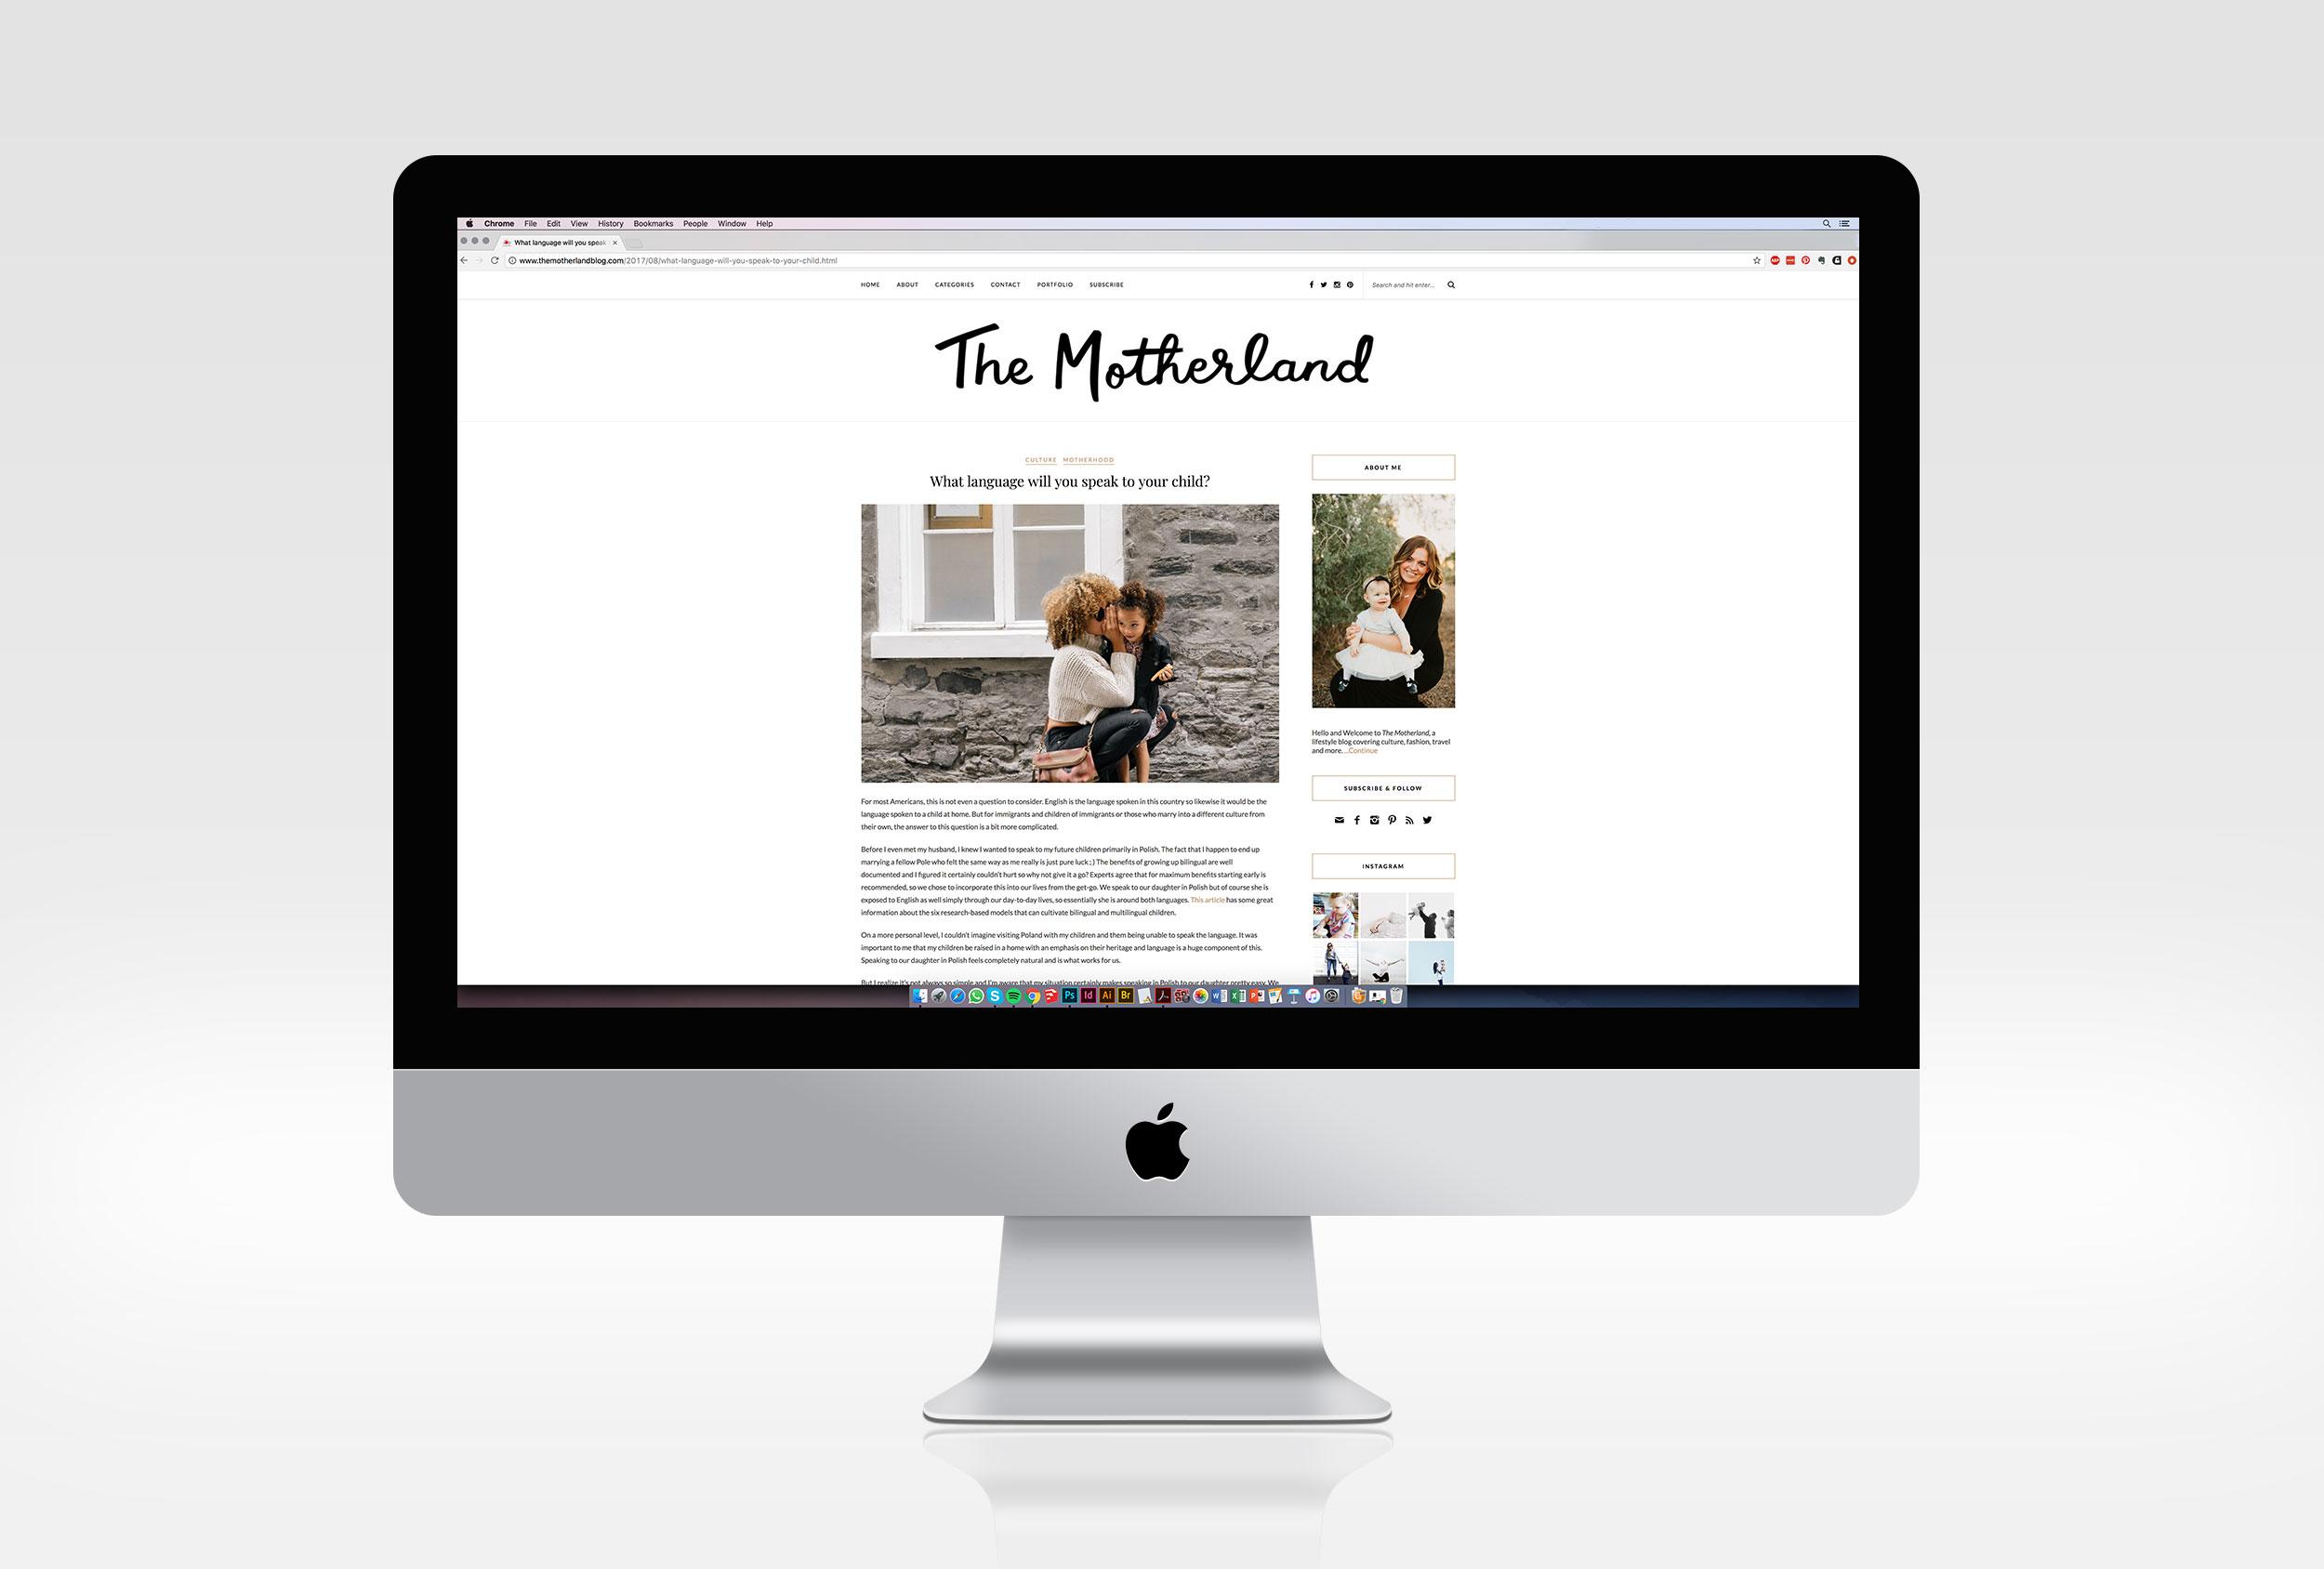 Finka_Studio_The_Motherland_Blog_Mockedup.jpg